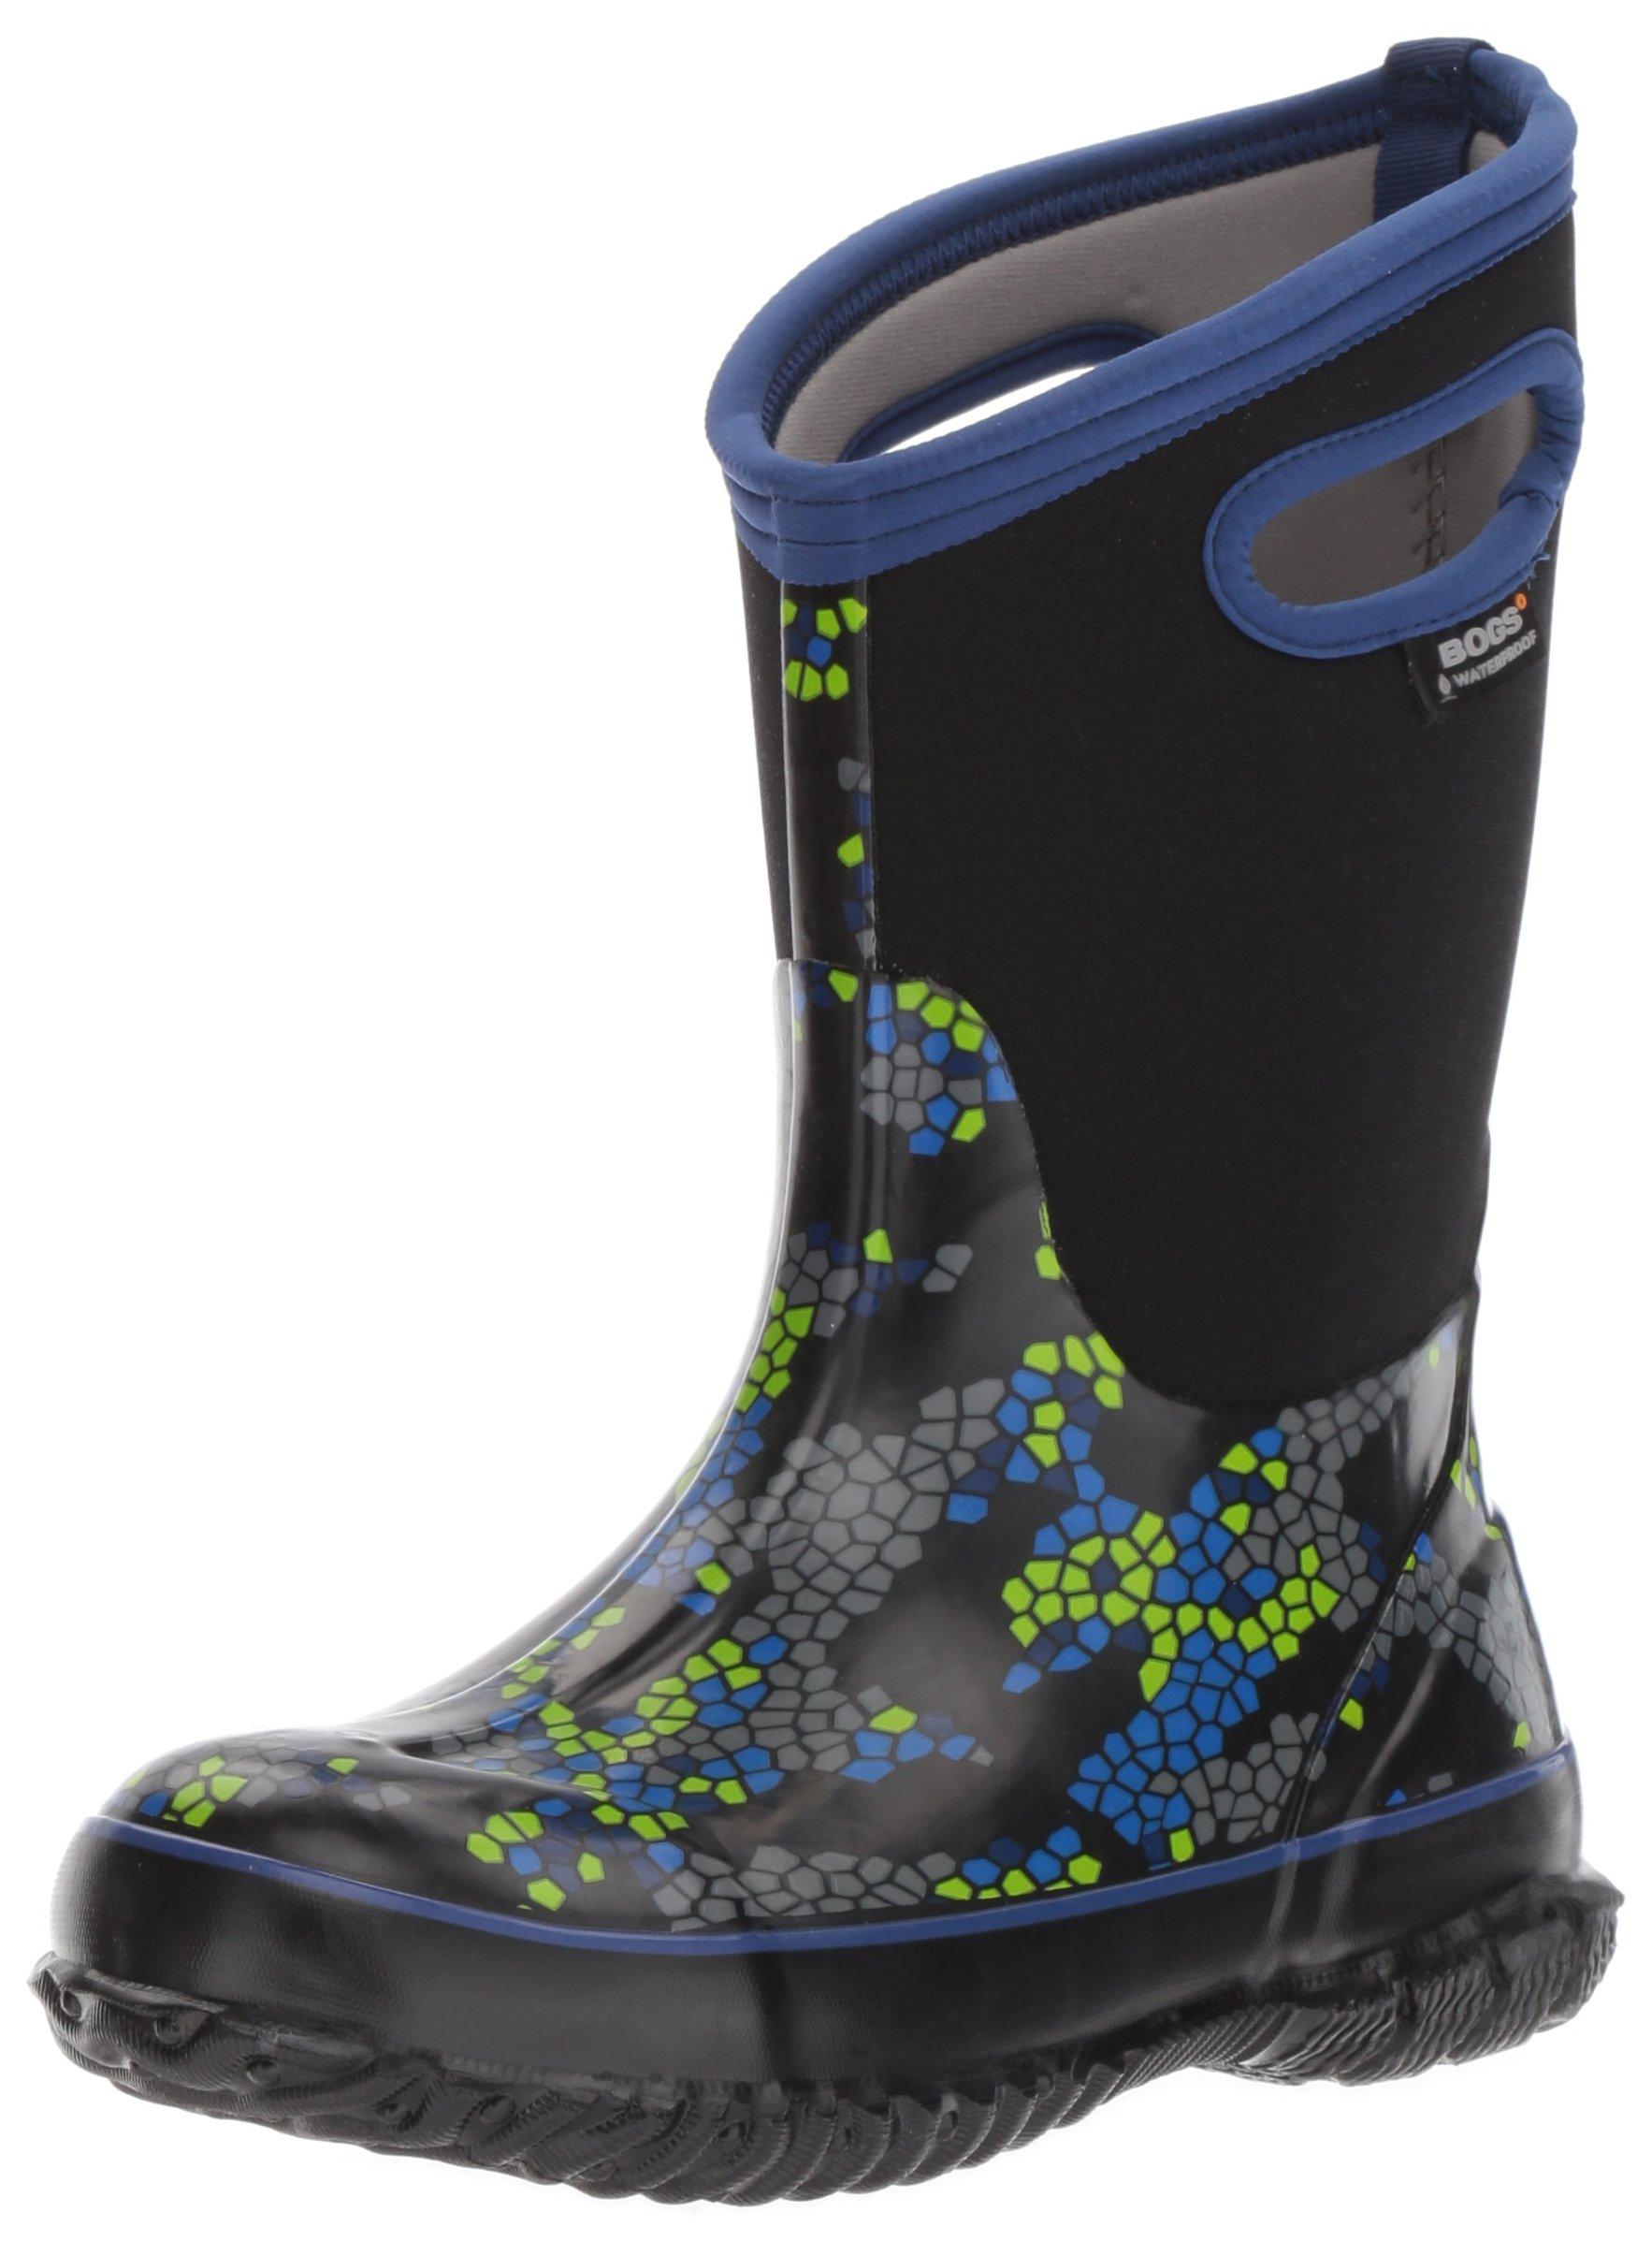 Bogs Classic High Waterproof Insulated Rubber Neoprene Rain Boot Snow, Axel Print/Black/Multi, 4 M US Big Kid